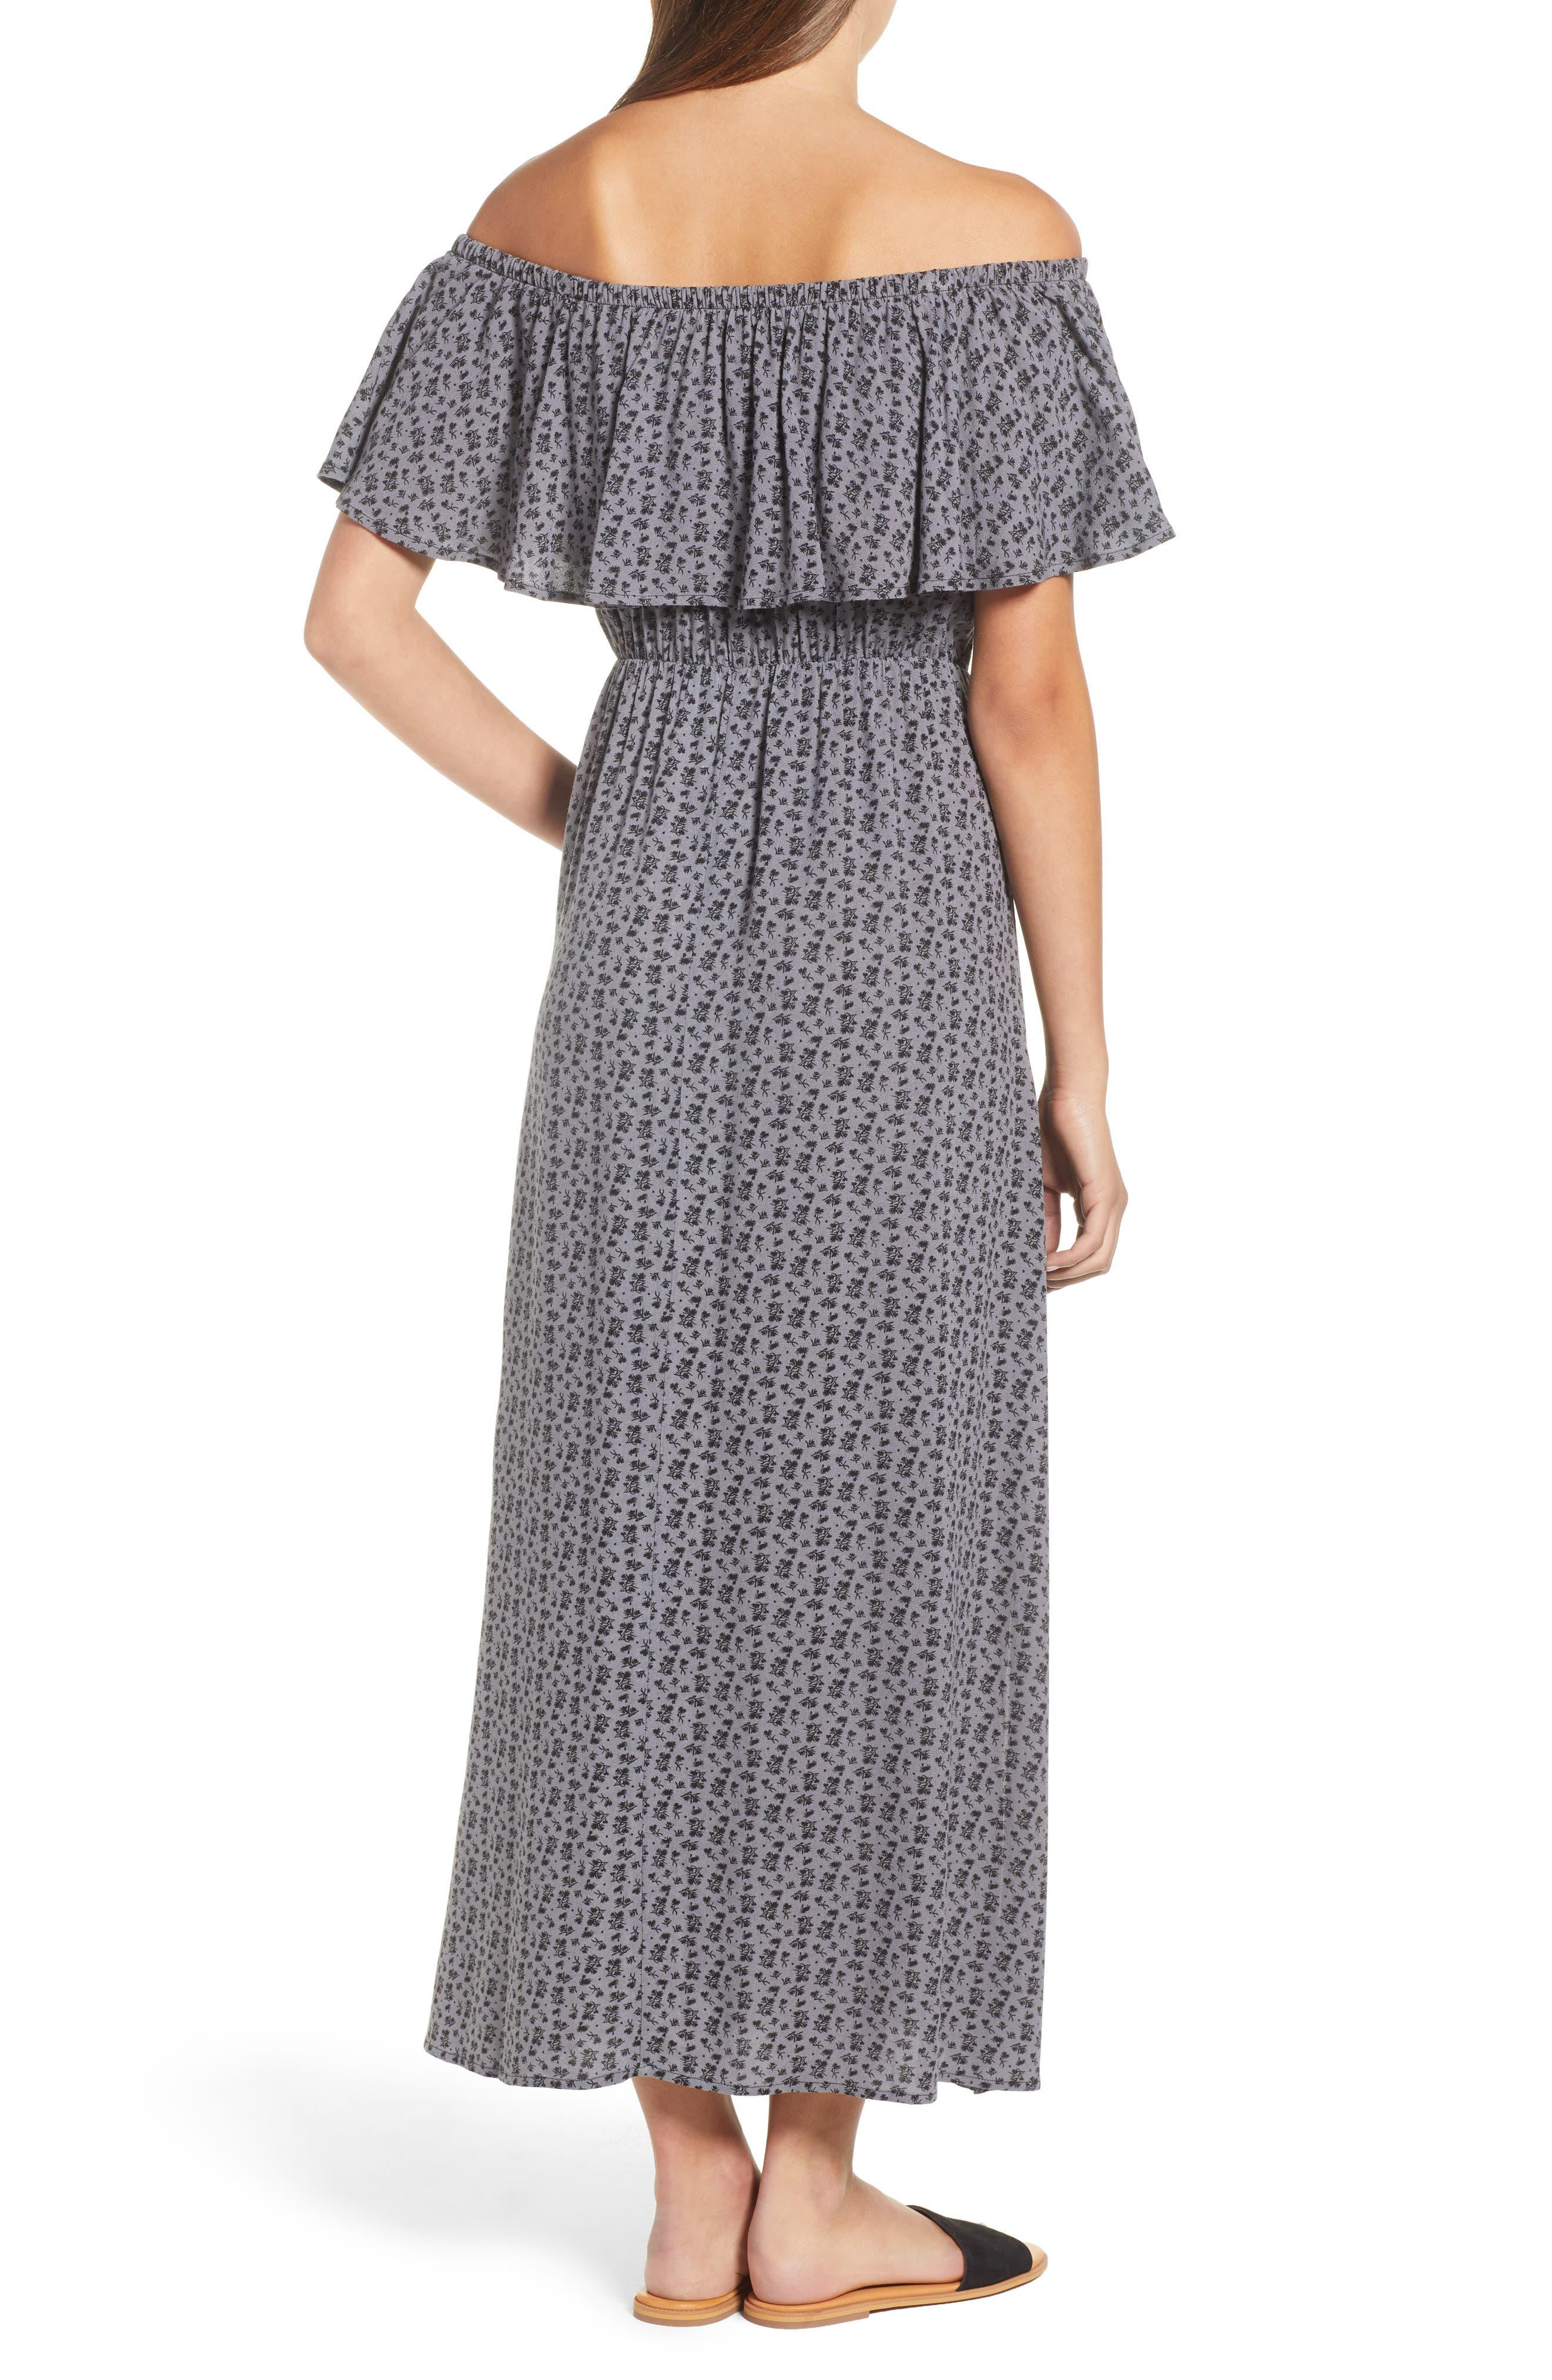 LIRA CLOTHING,                             Marissa Floral Print Off the Shoulder Dress,                             Alternate thumbnail 2, color,                             250